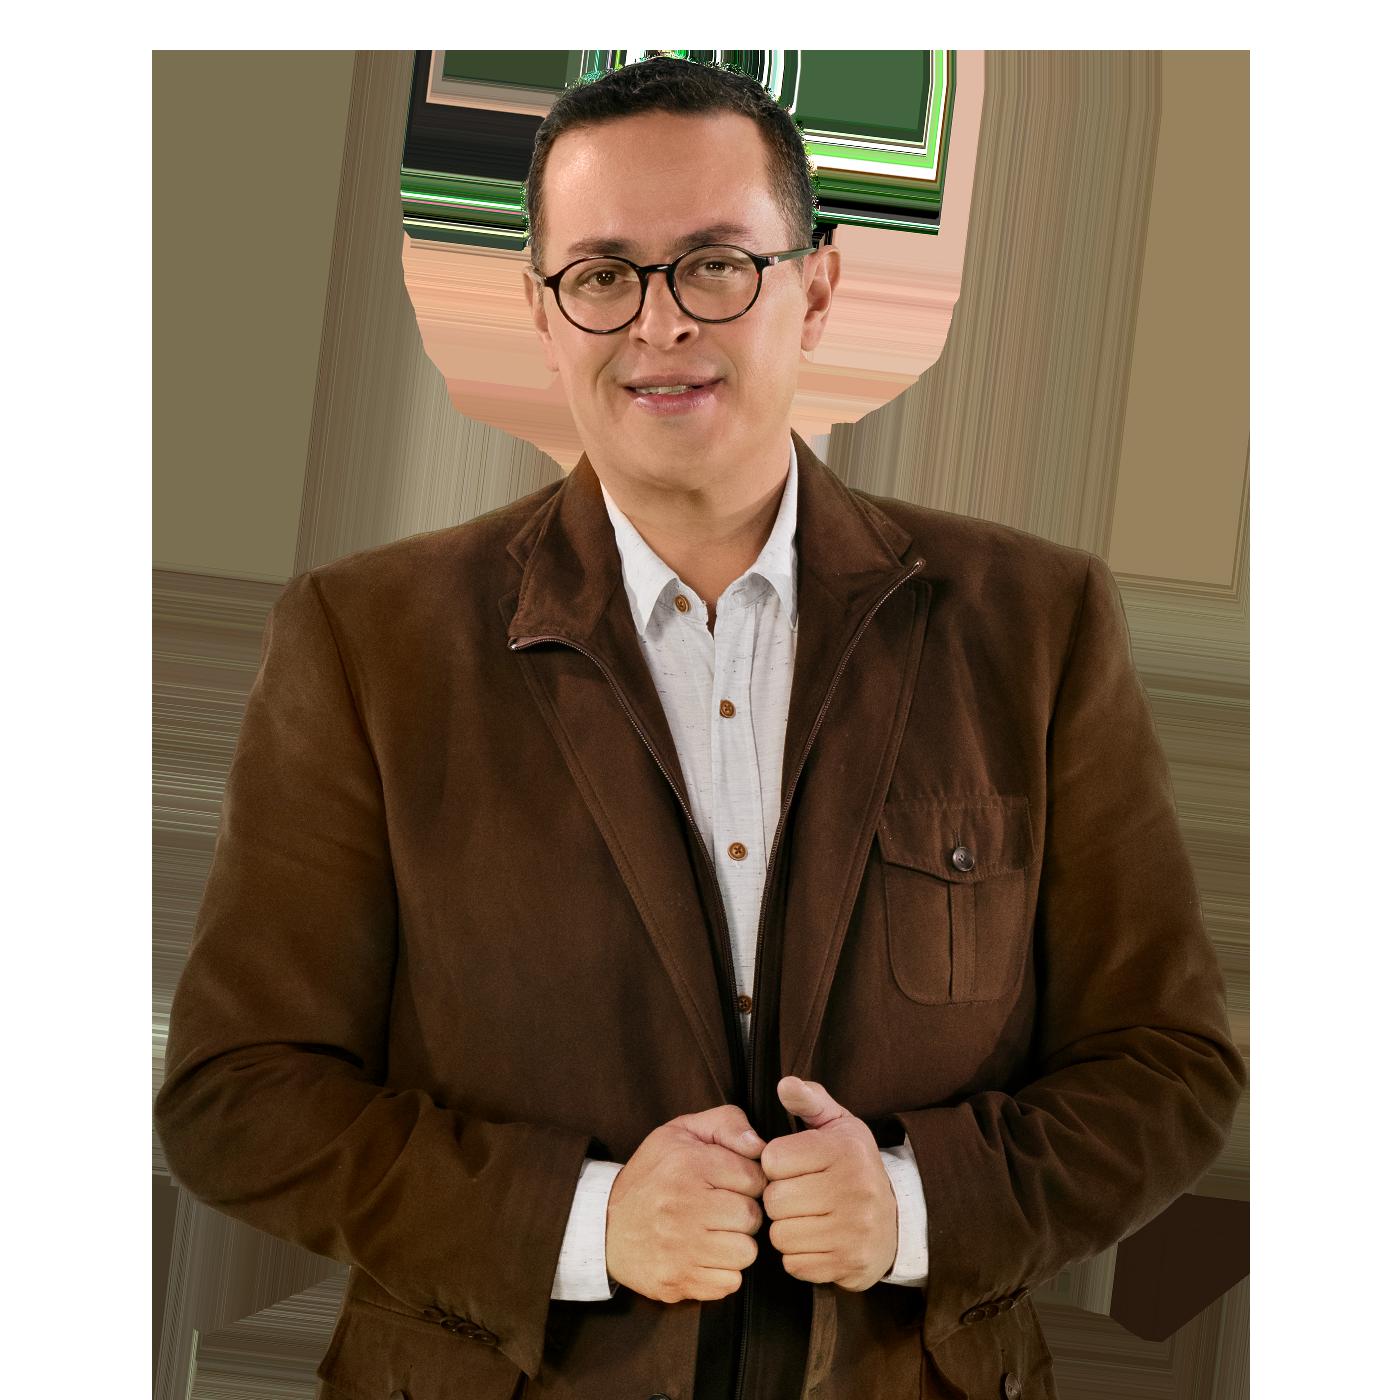 Enrique Hernández Alcázar